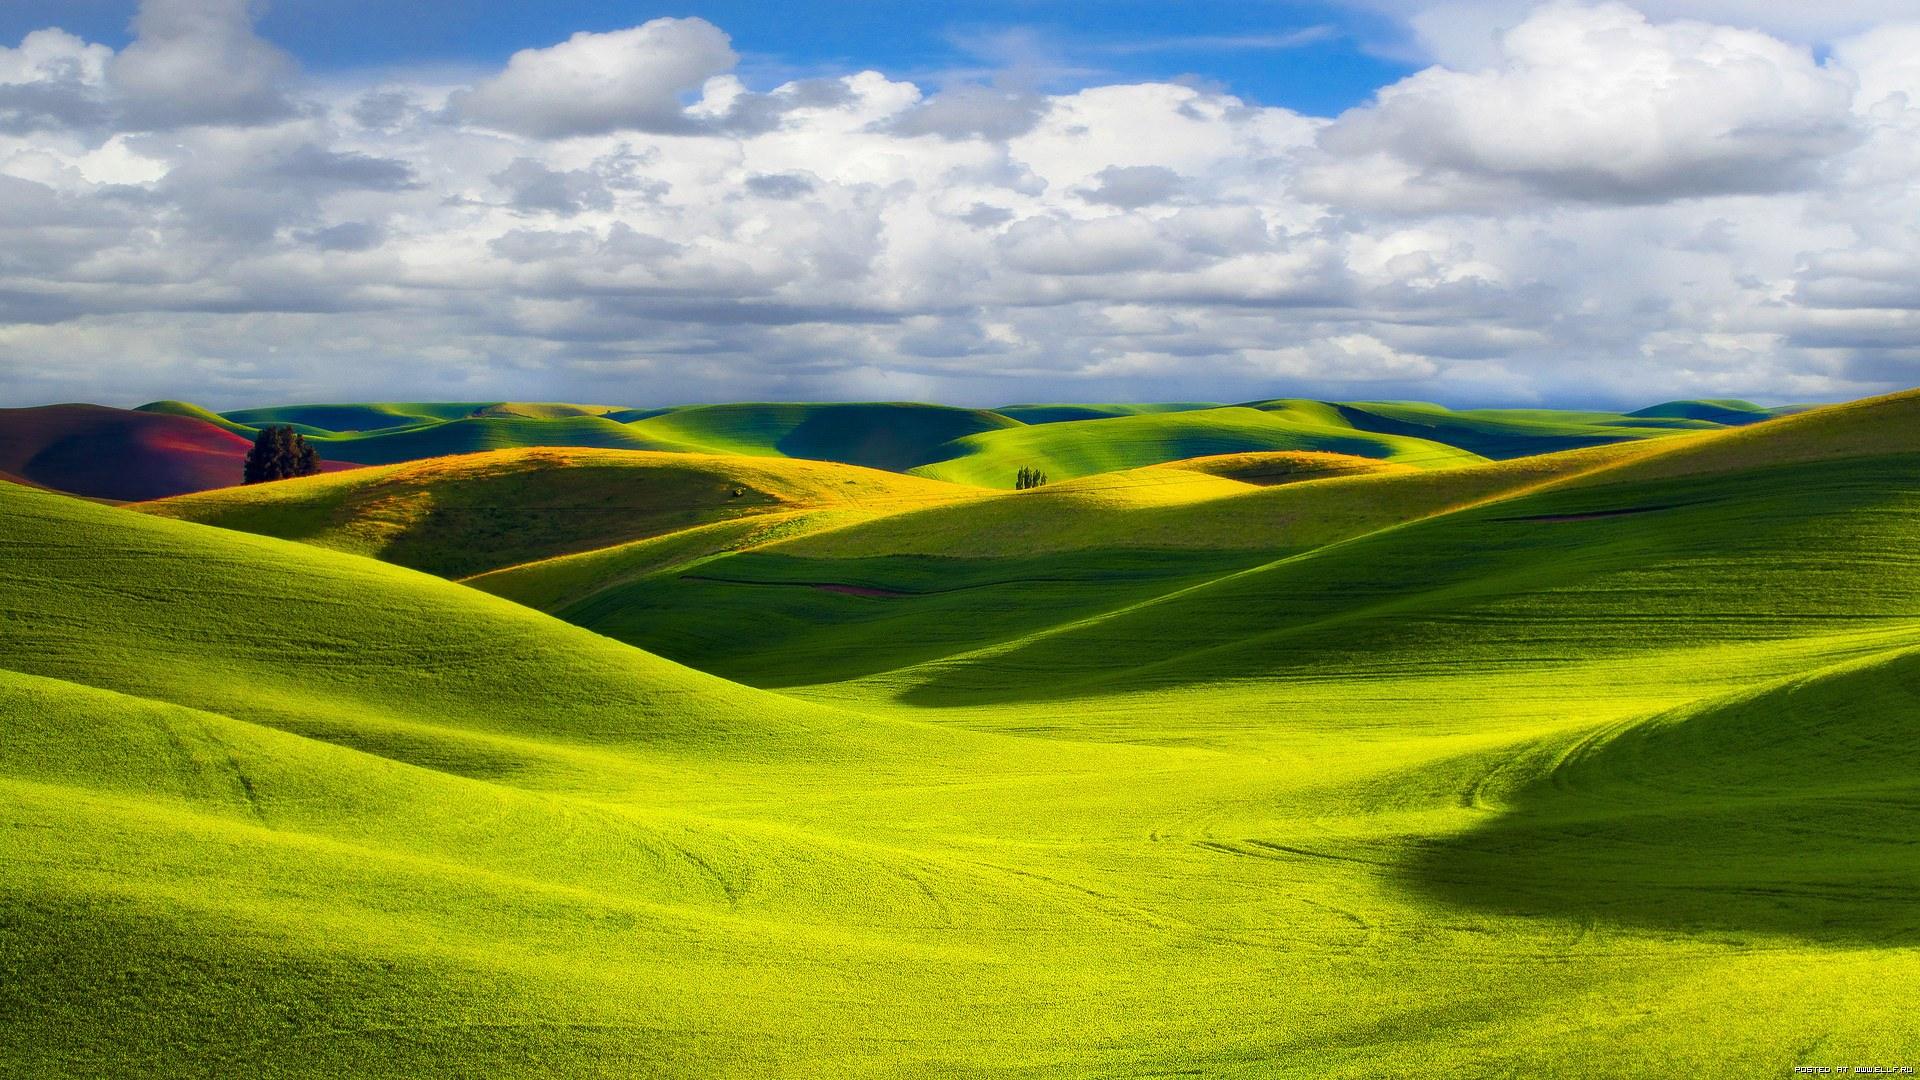 landscape-desktop-wallpaper- (13)